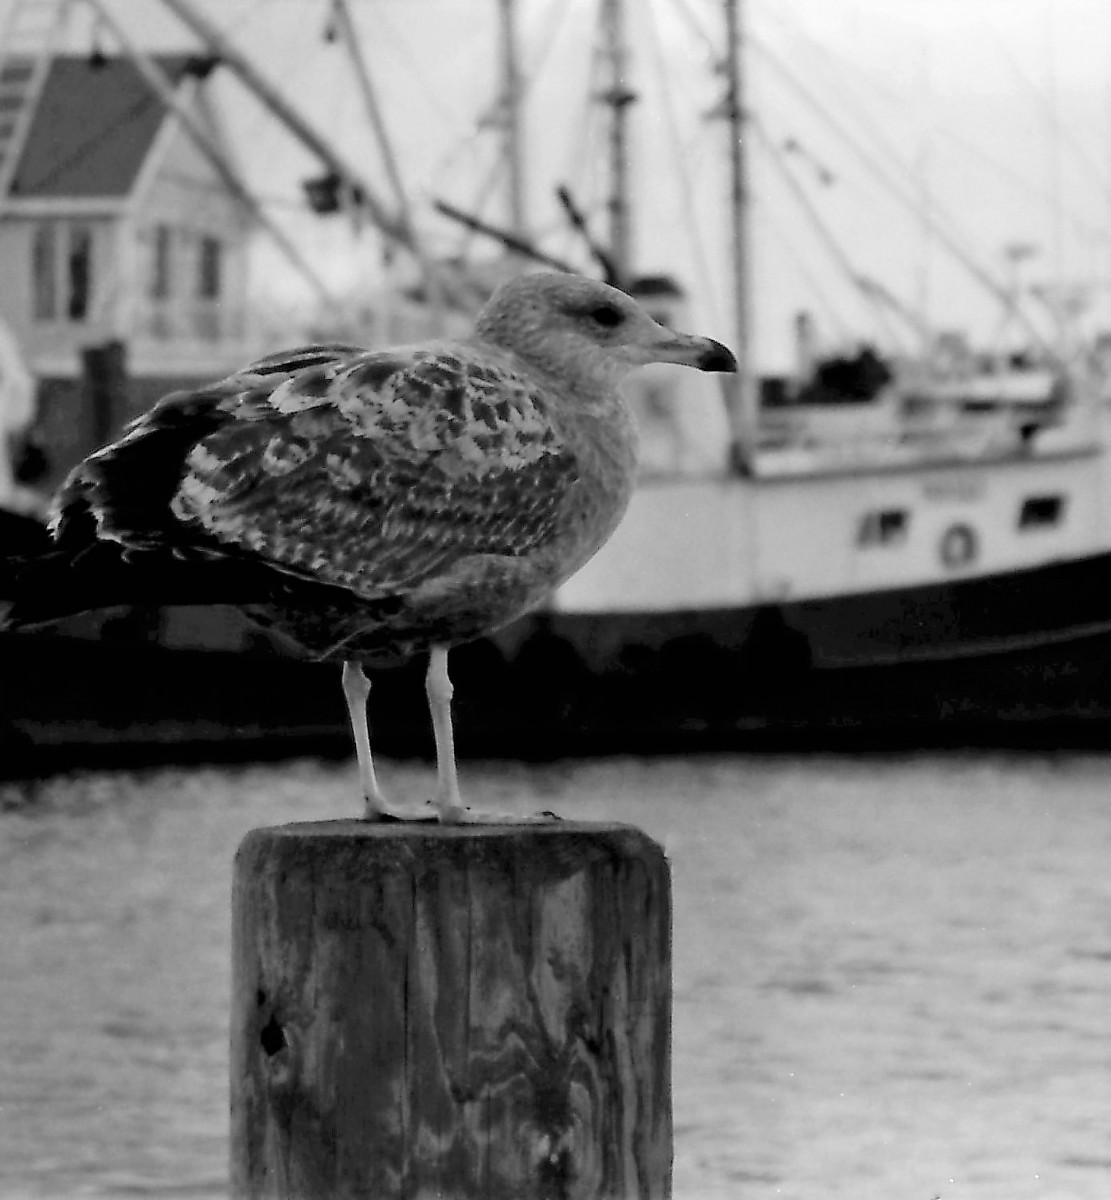 bird-pt-plst-2